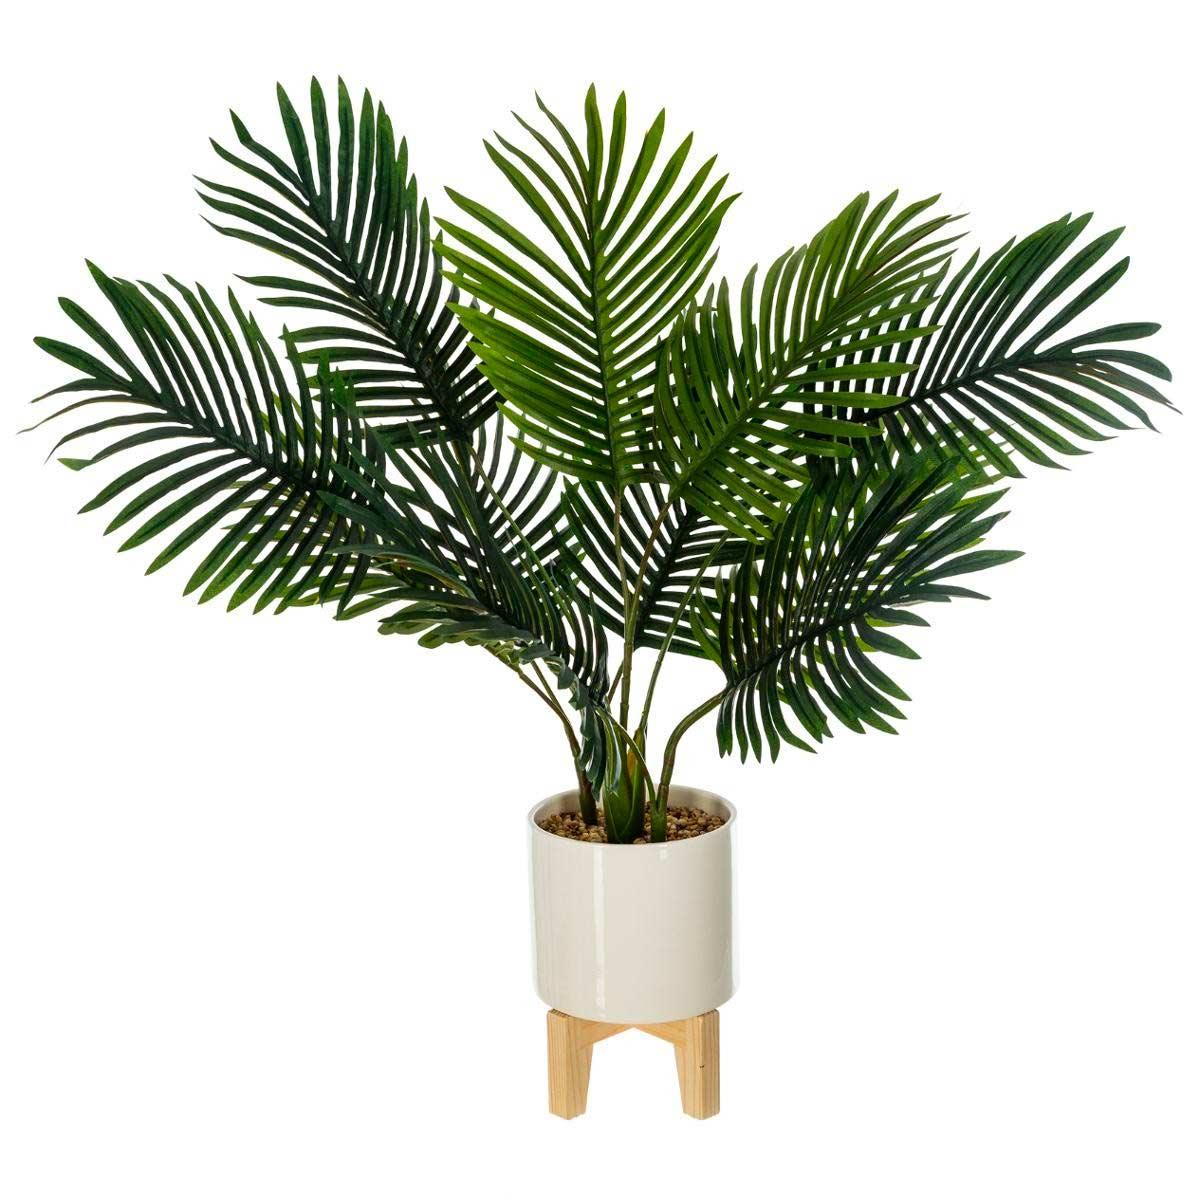 GLOVER PALM TREE POT 72cm